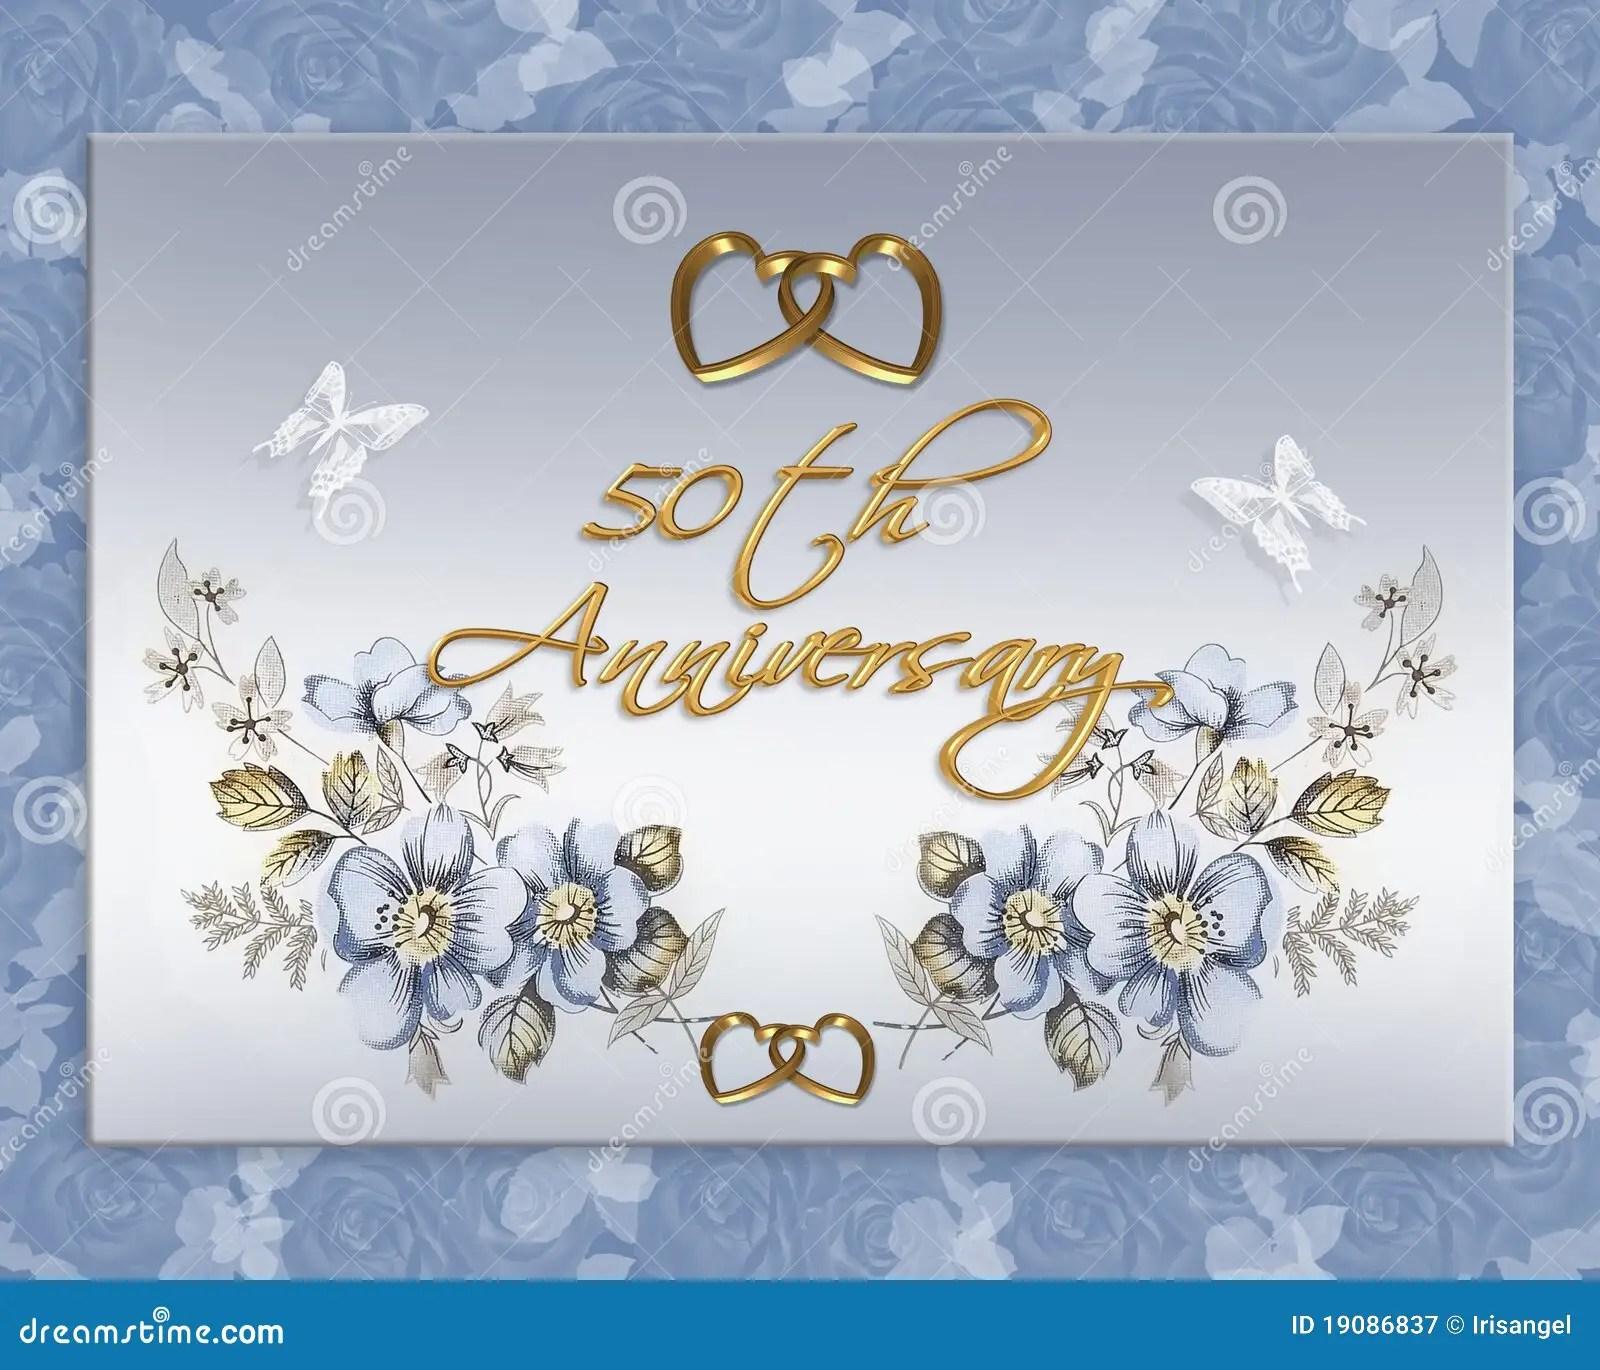 50th Wedding Anniversary Card Stock Illustration